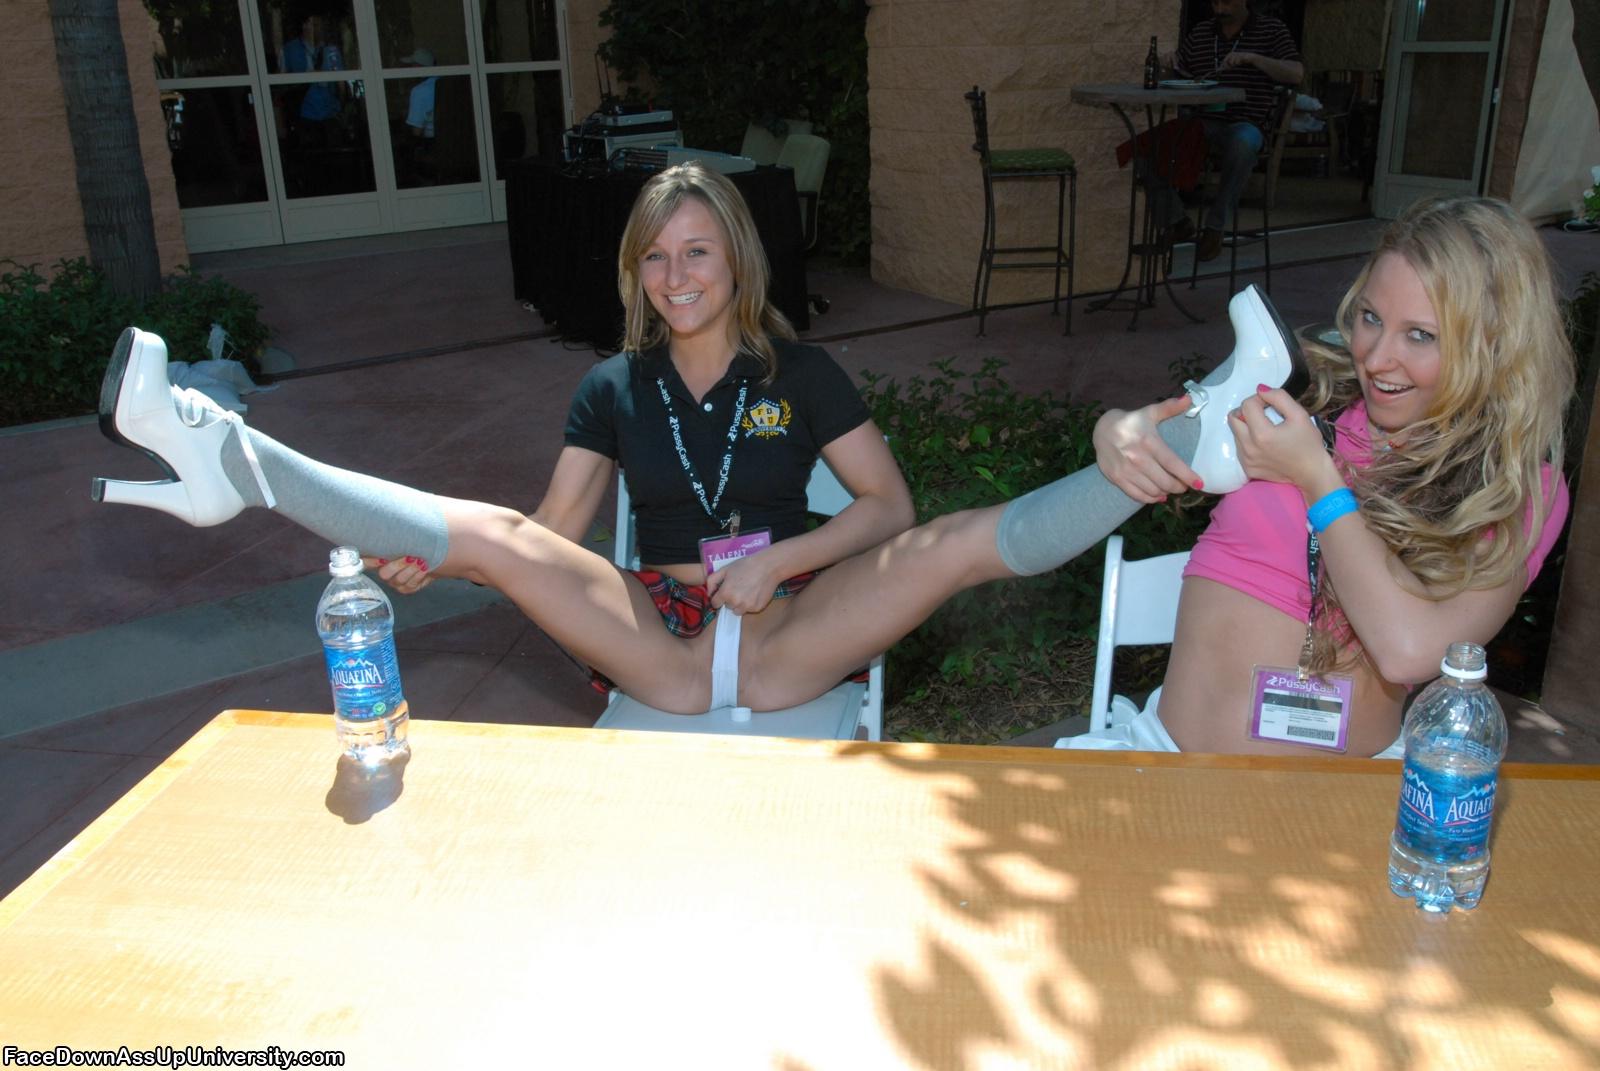 http://images.hottystop.com/sexy-schoolgirl-convention/6.jpg